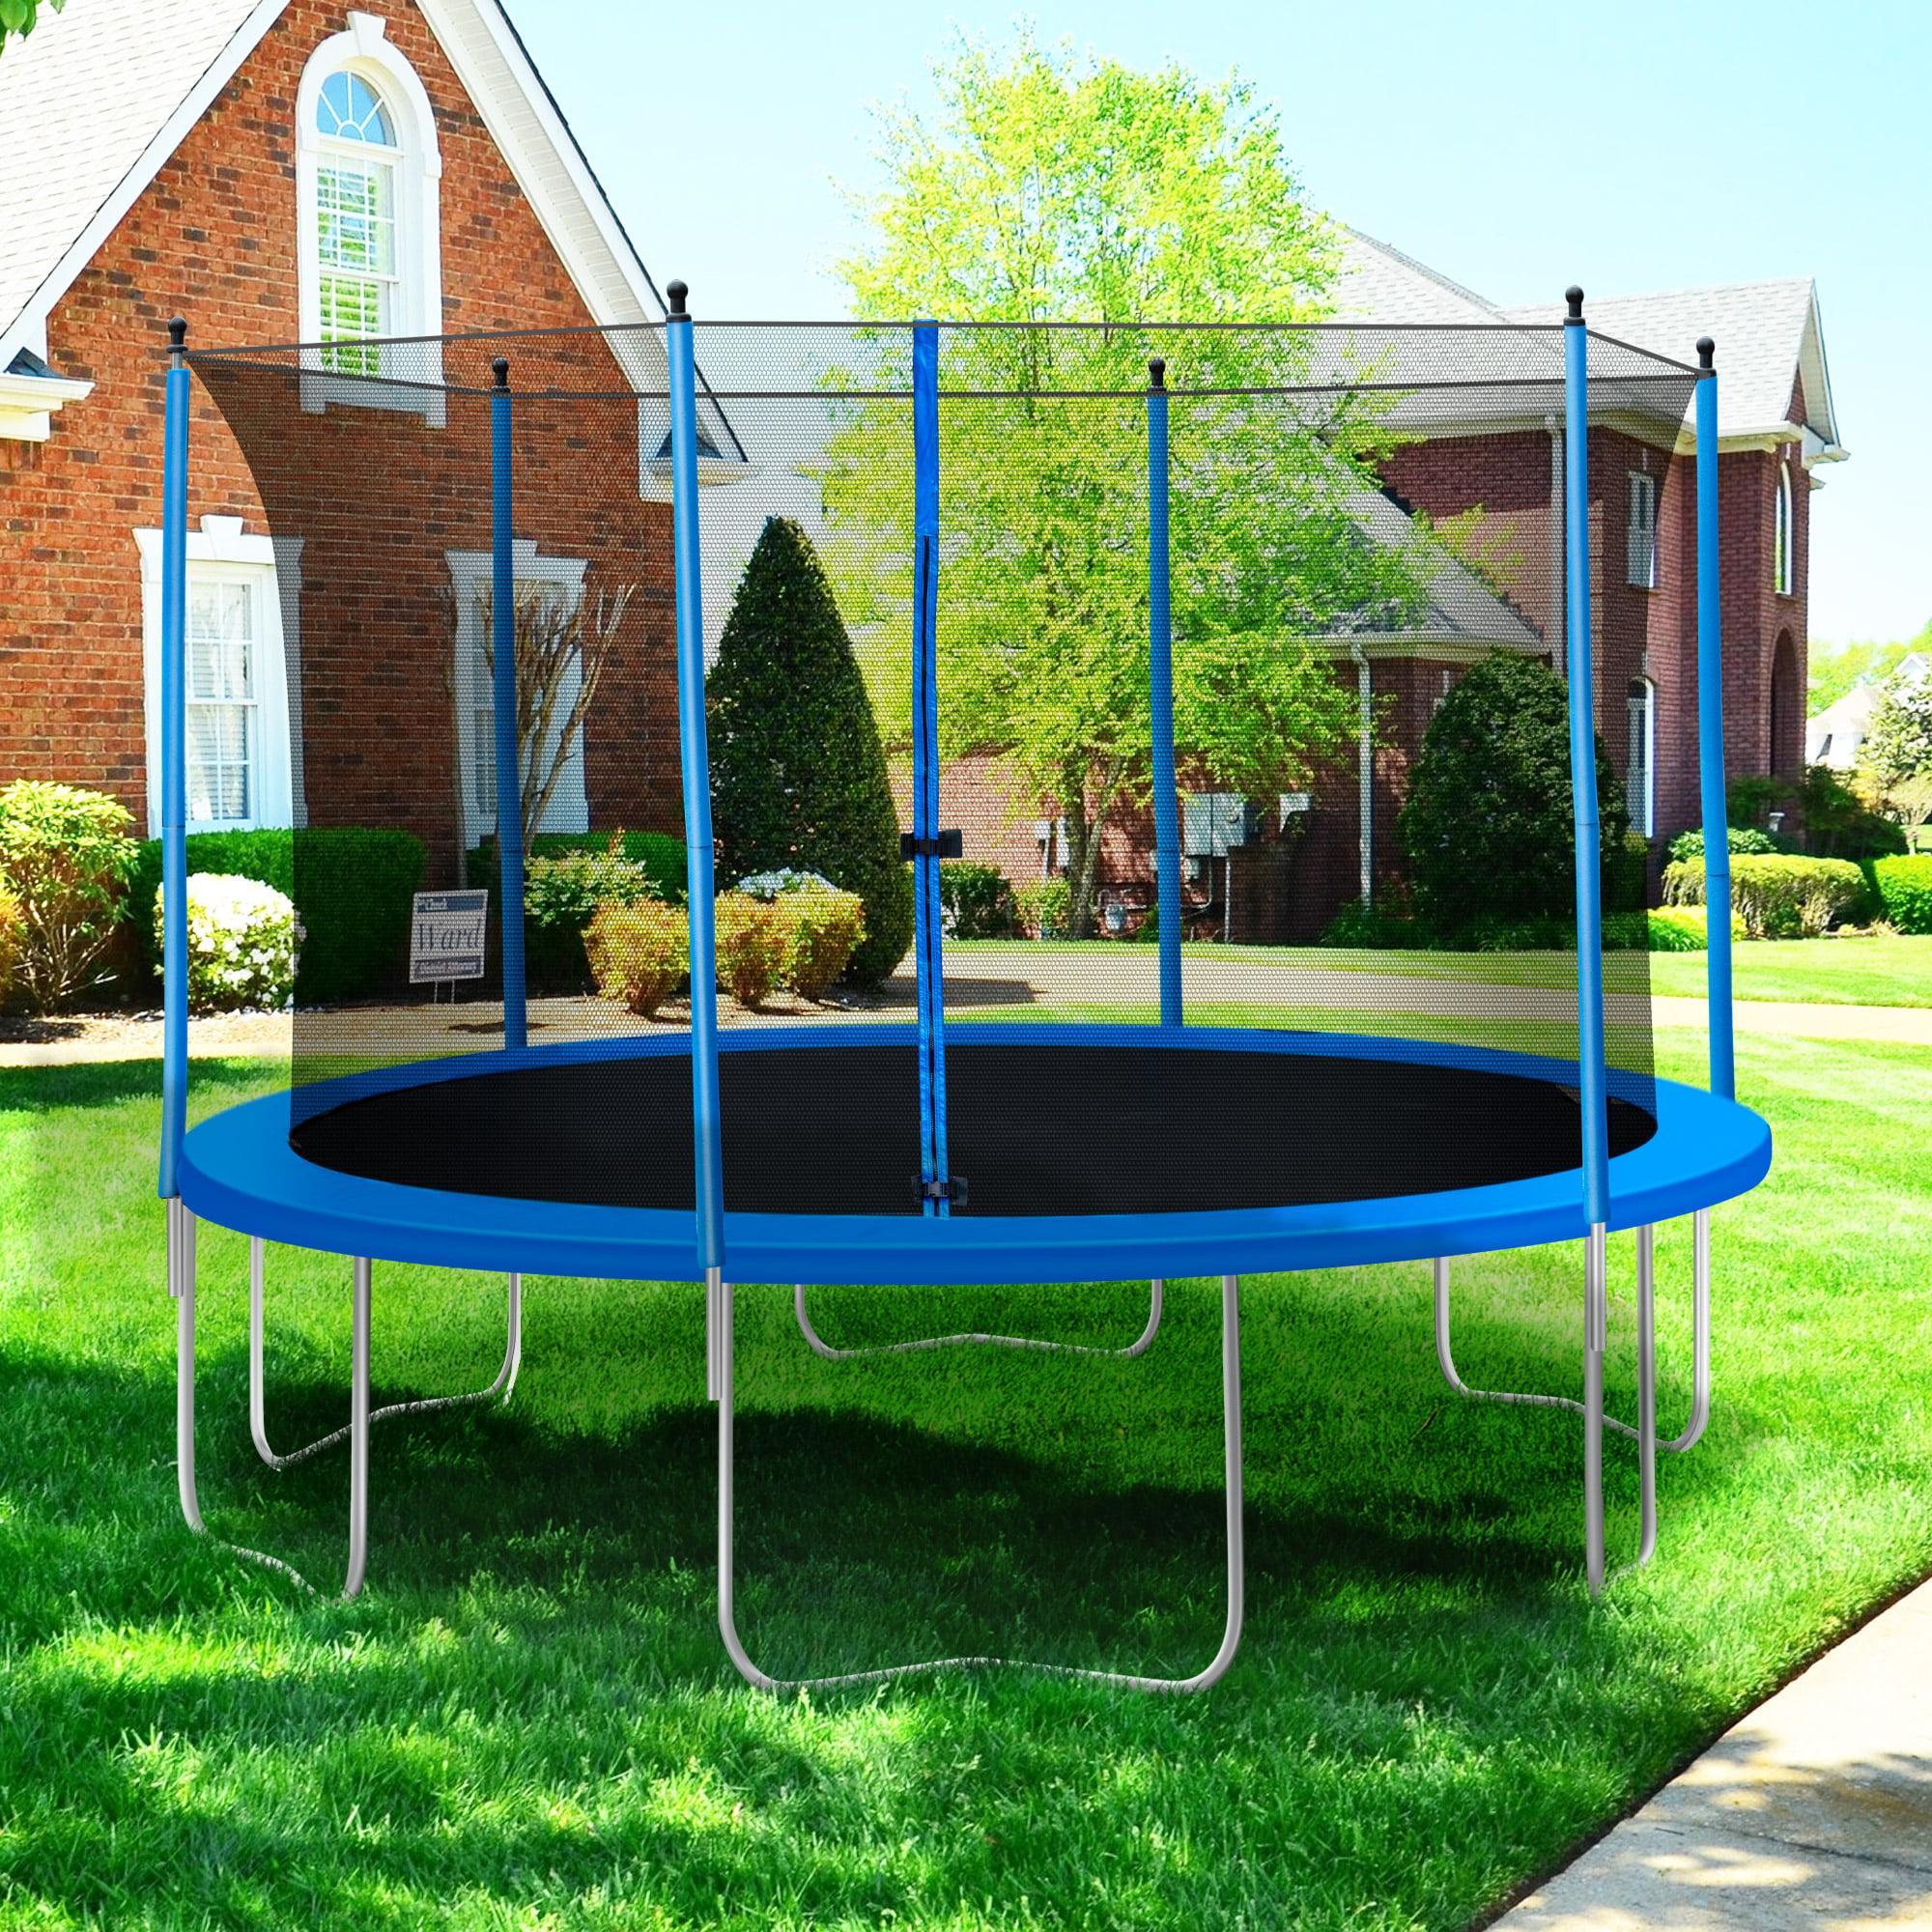 Amigo trampoline with safety net 139 cm red